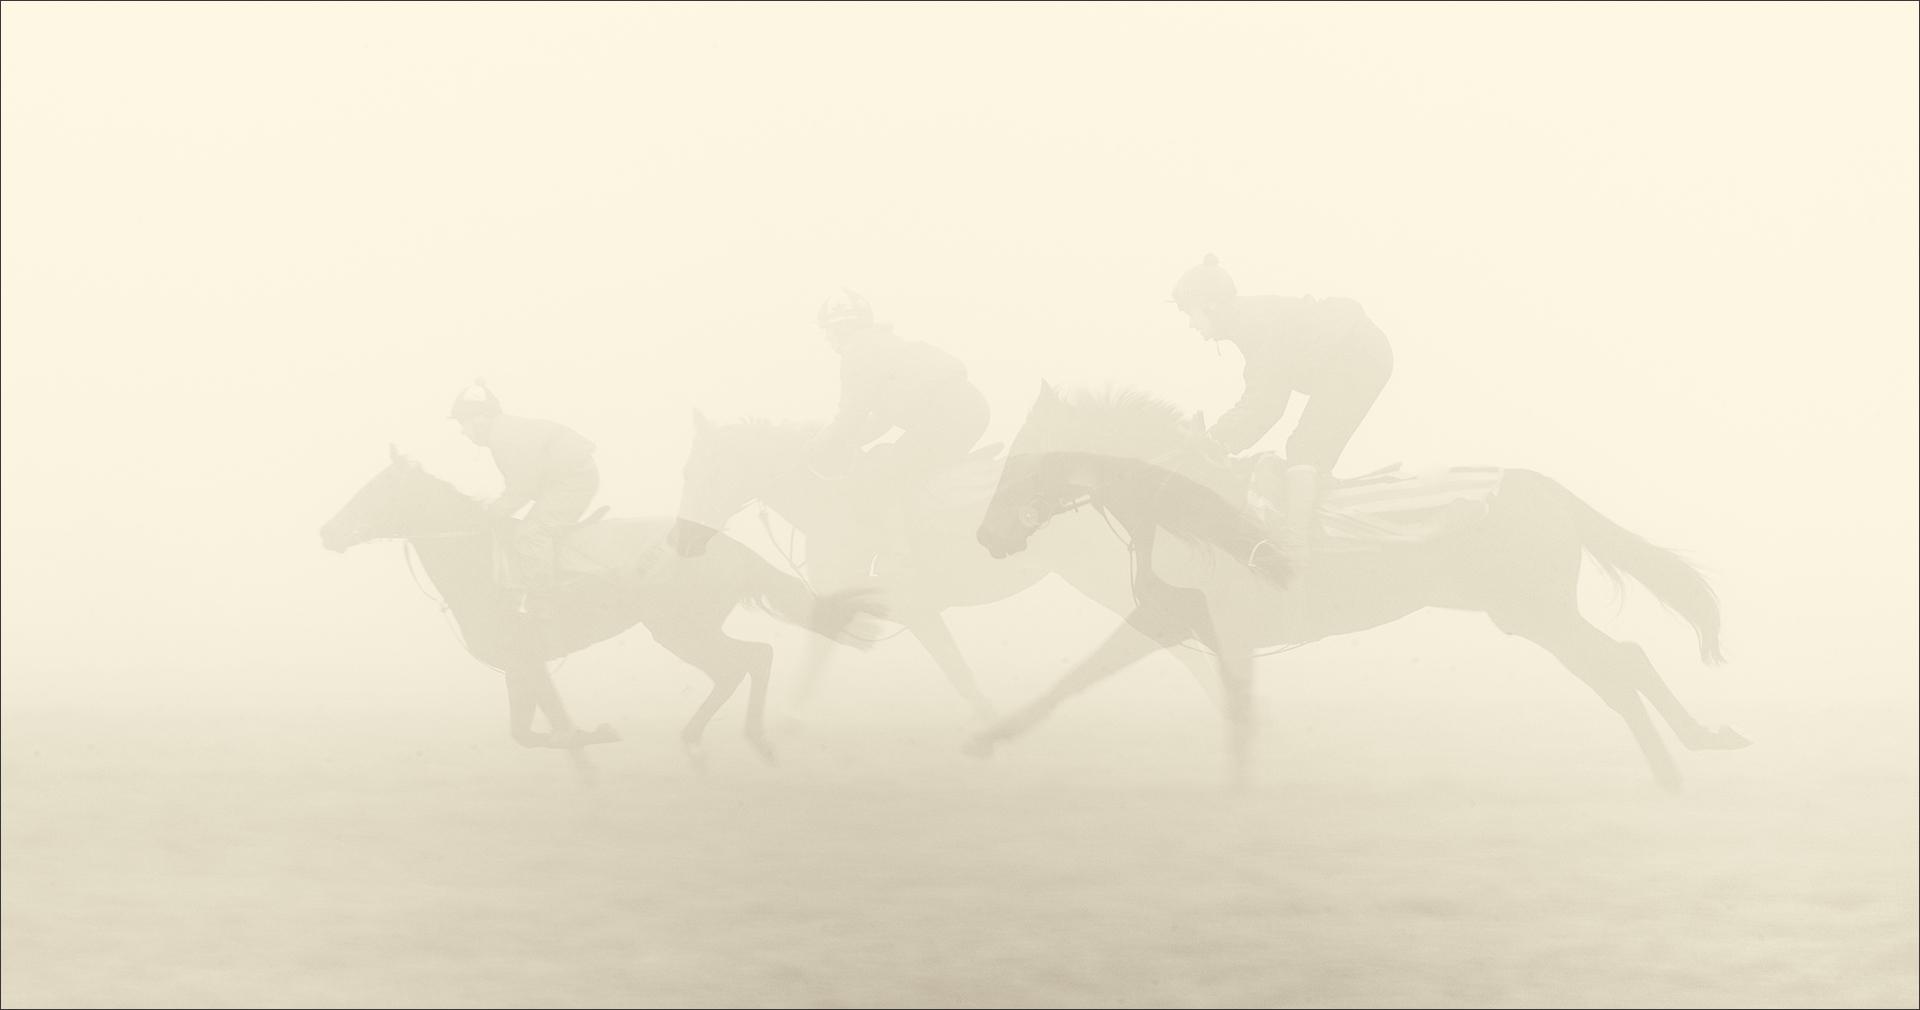 Racing in the Mist